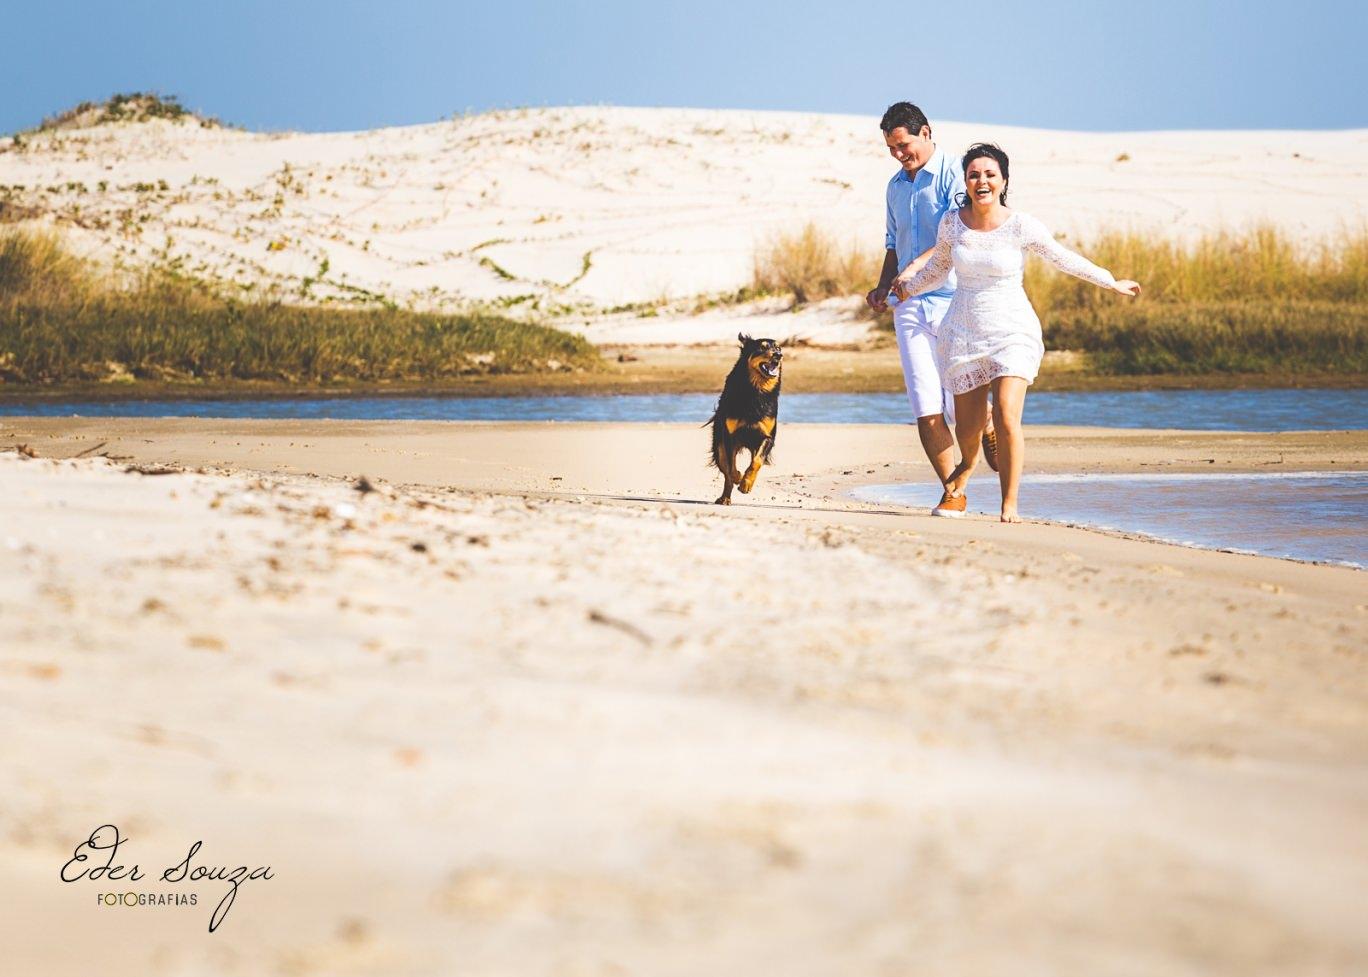 Pré Wedding Simone e Walter